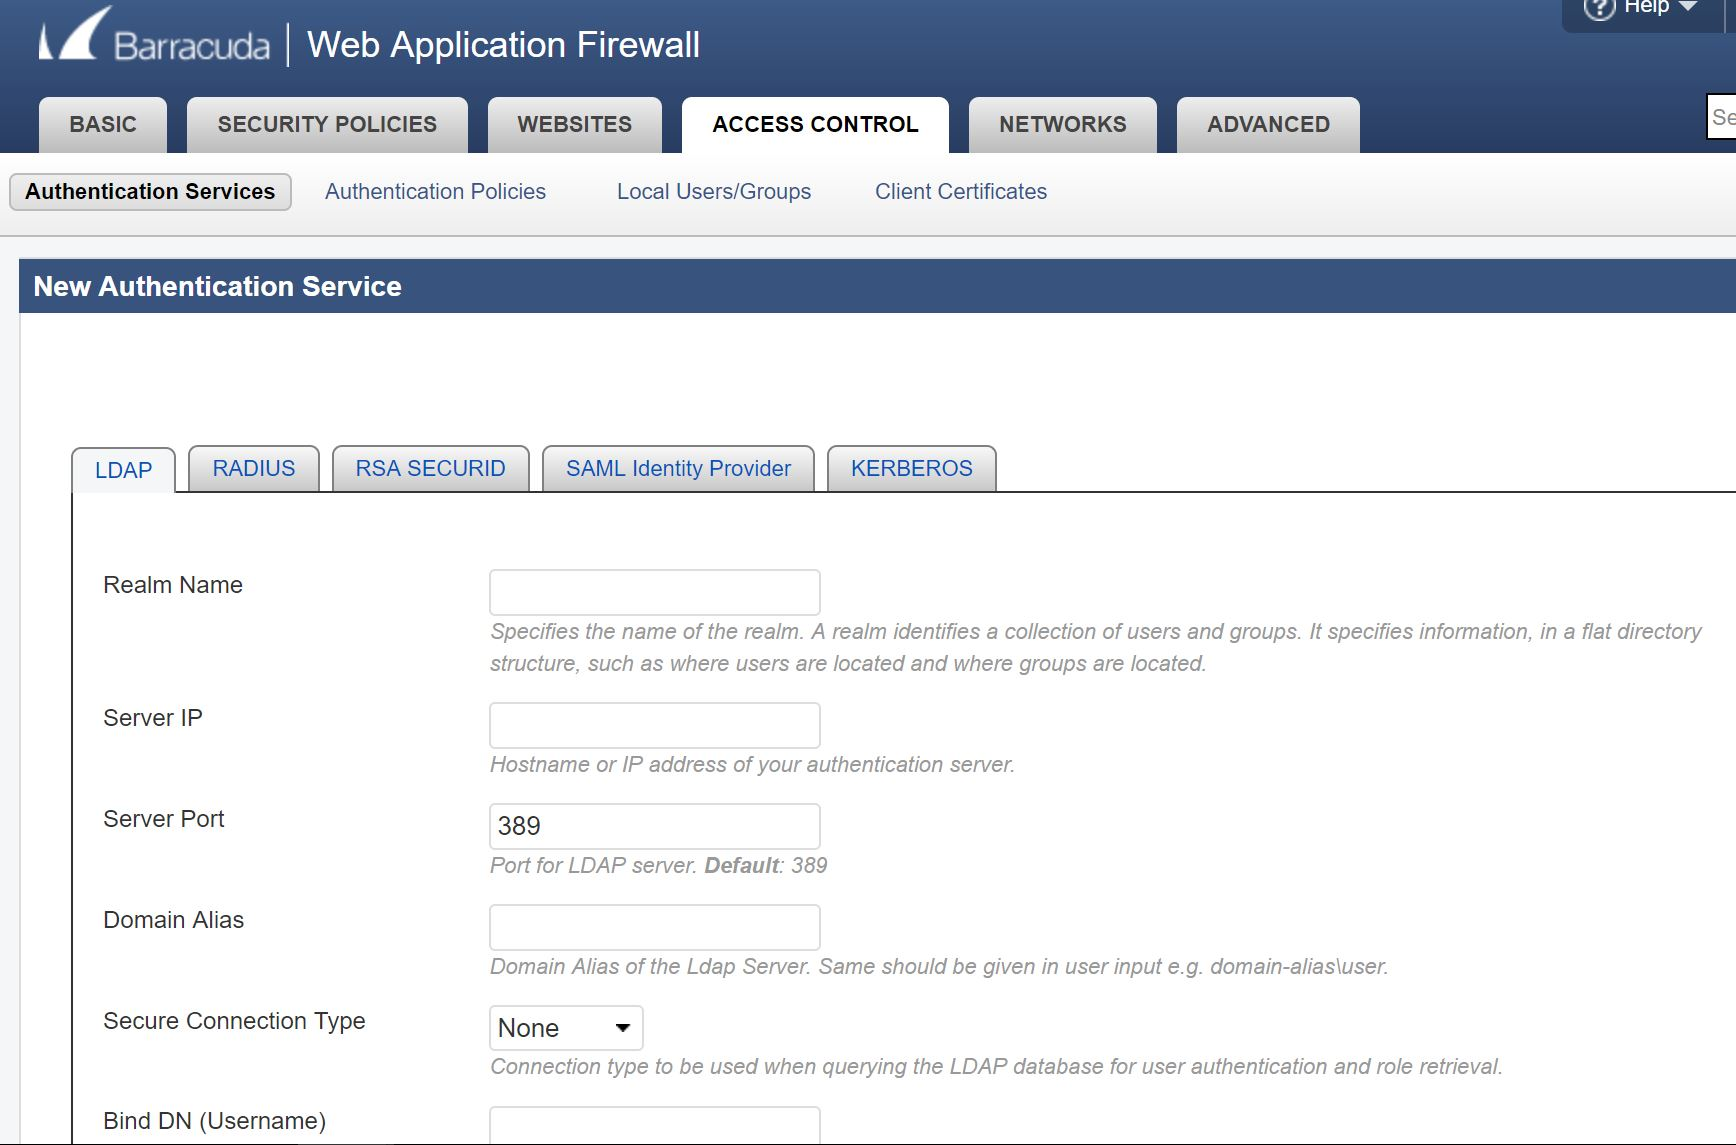 barracuda web application firewall review